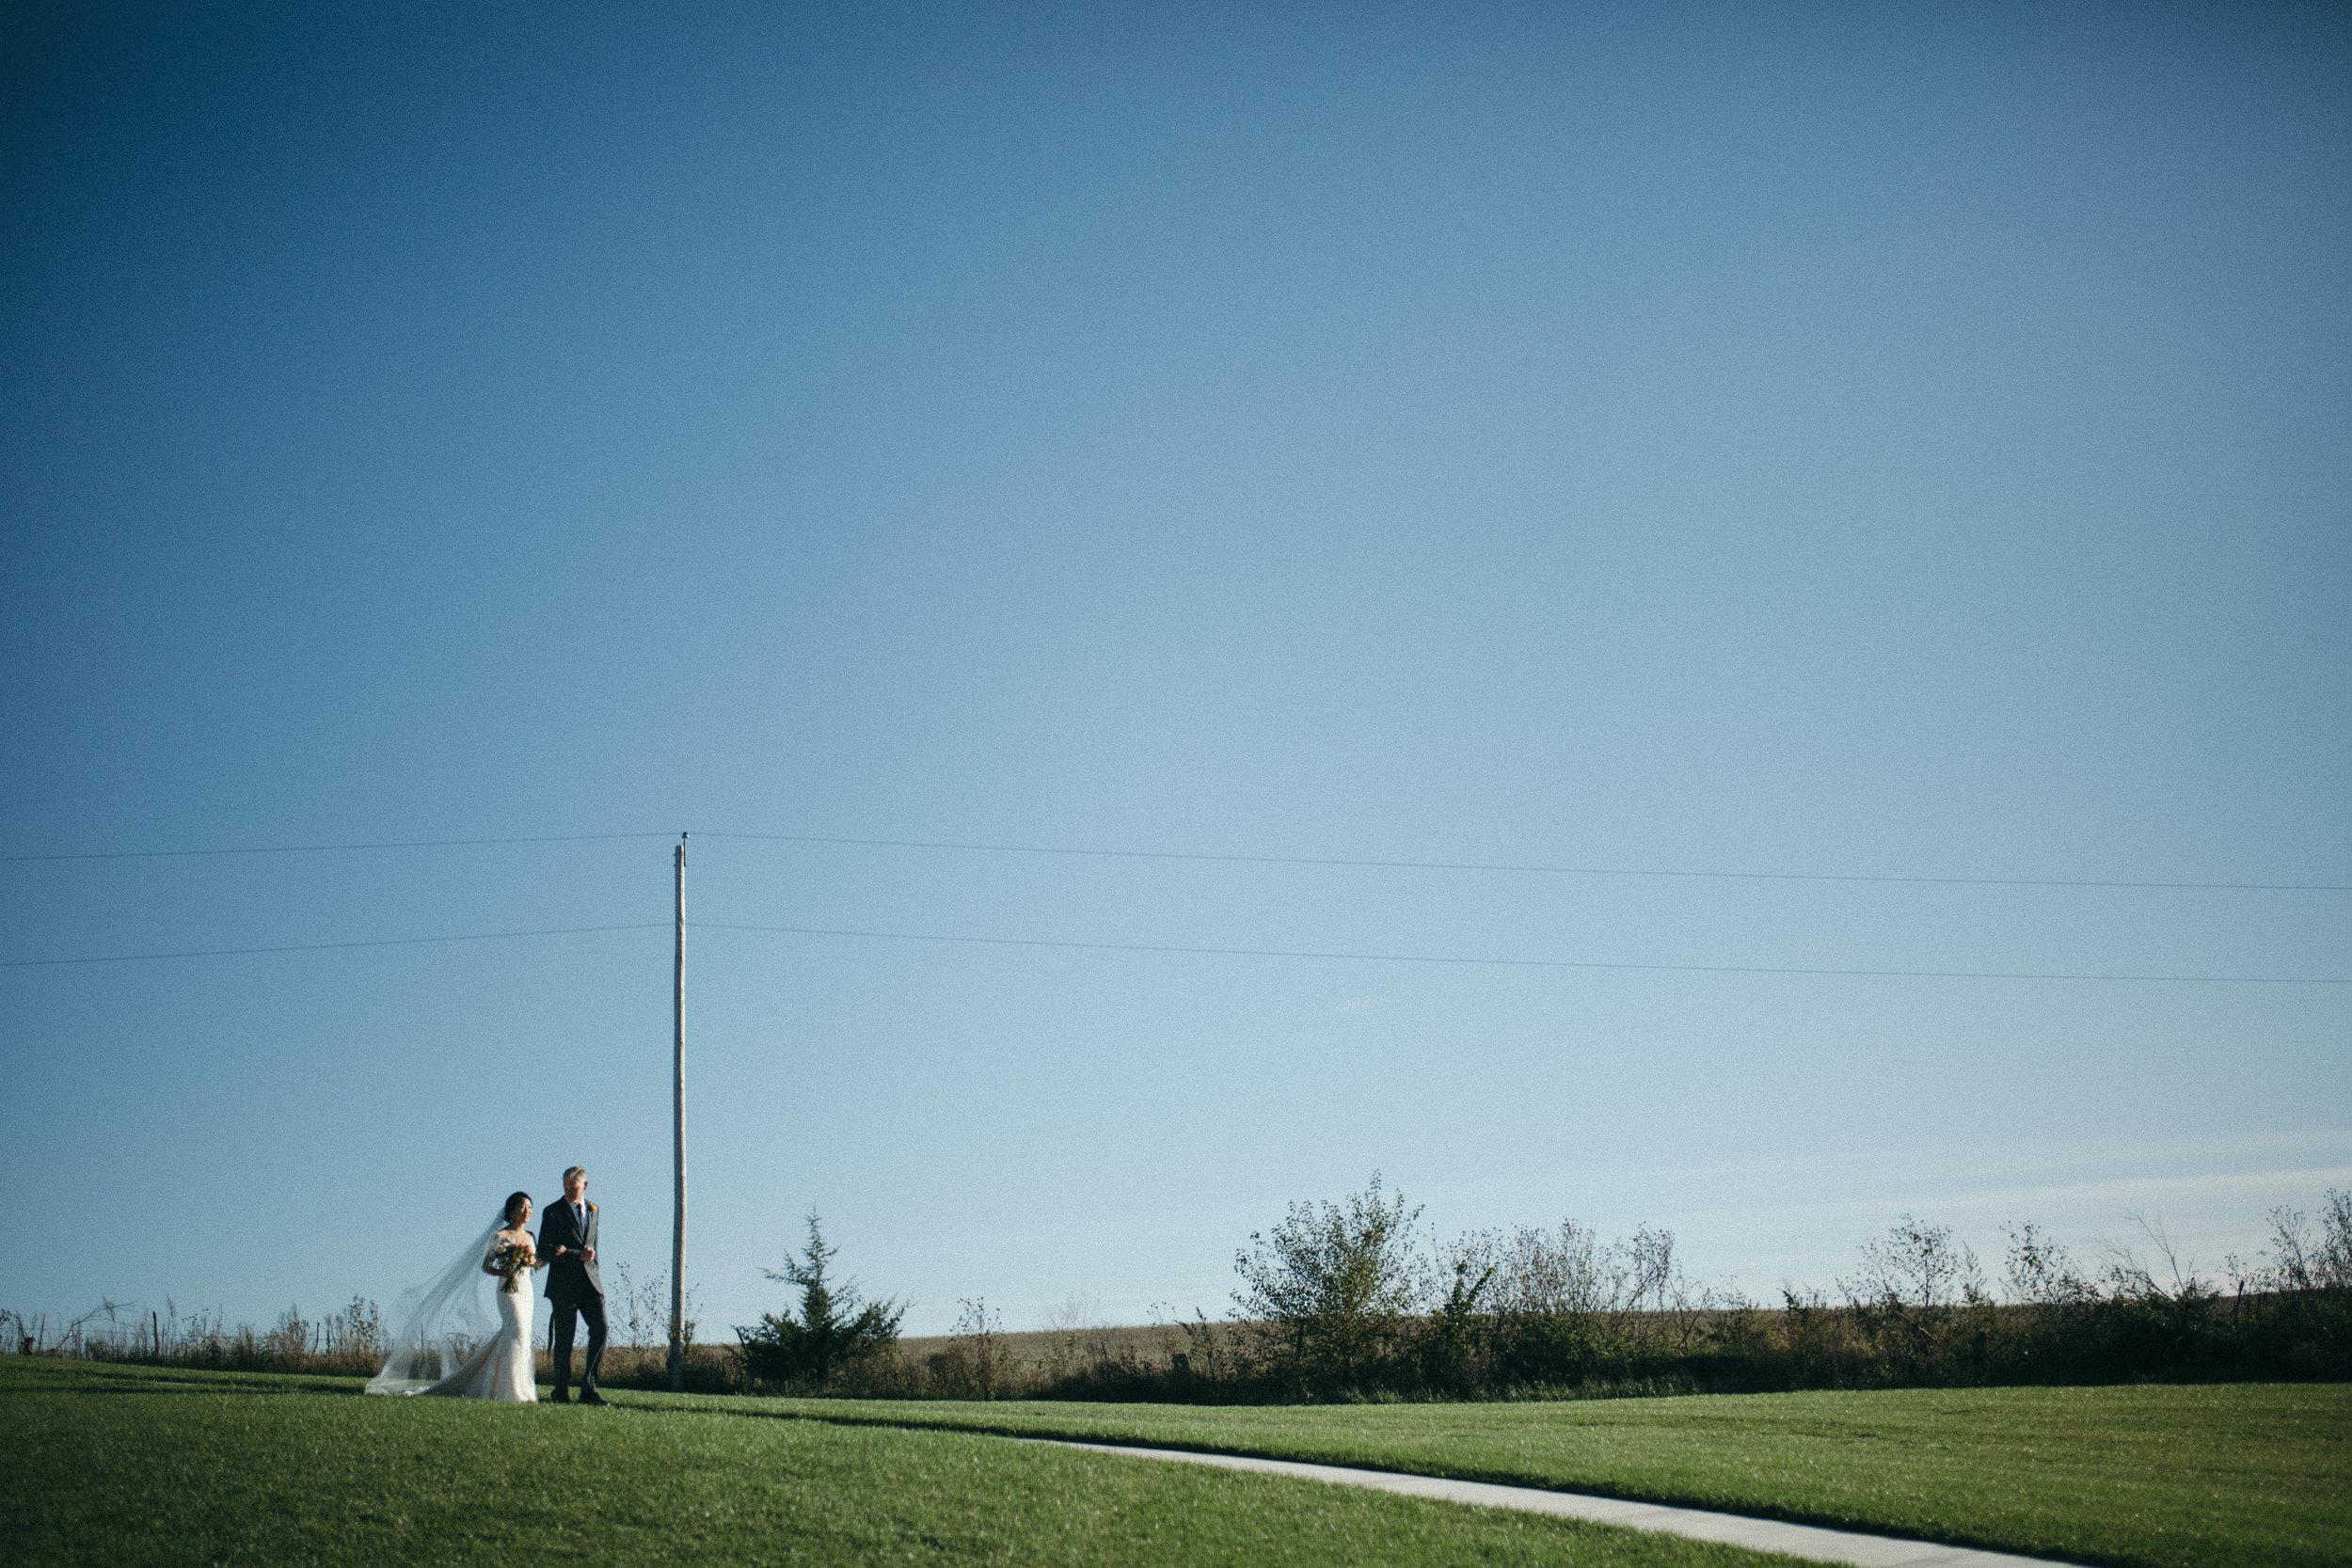 bailey-jared-wedding-blog-54.jpg